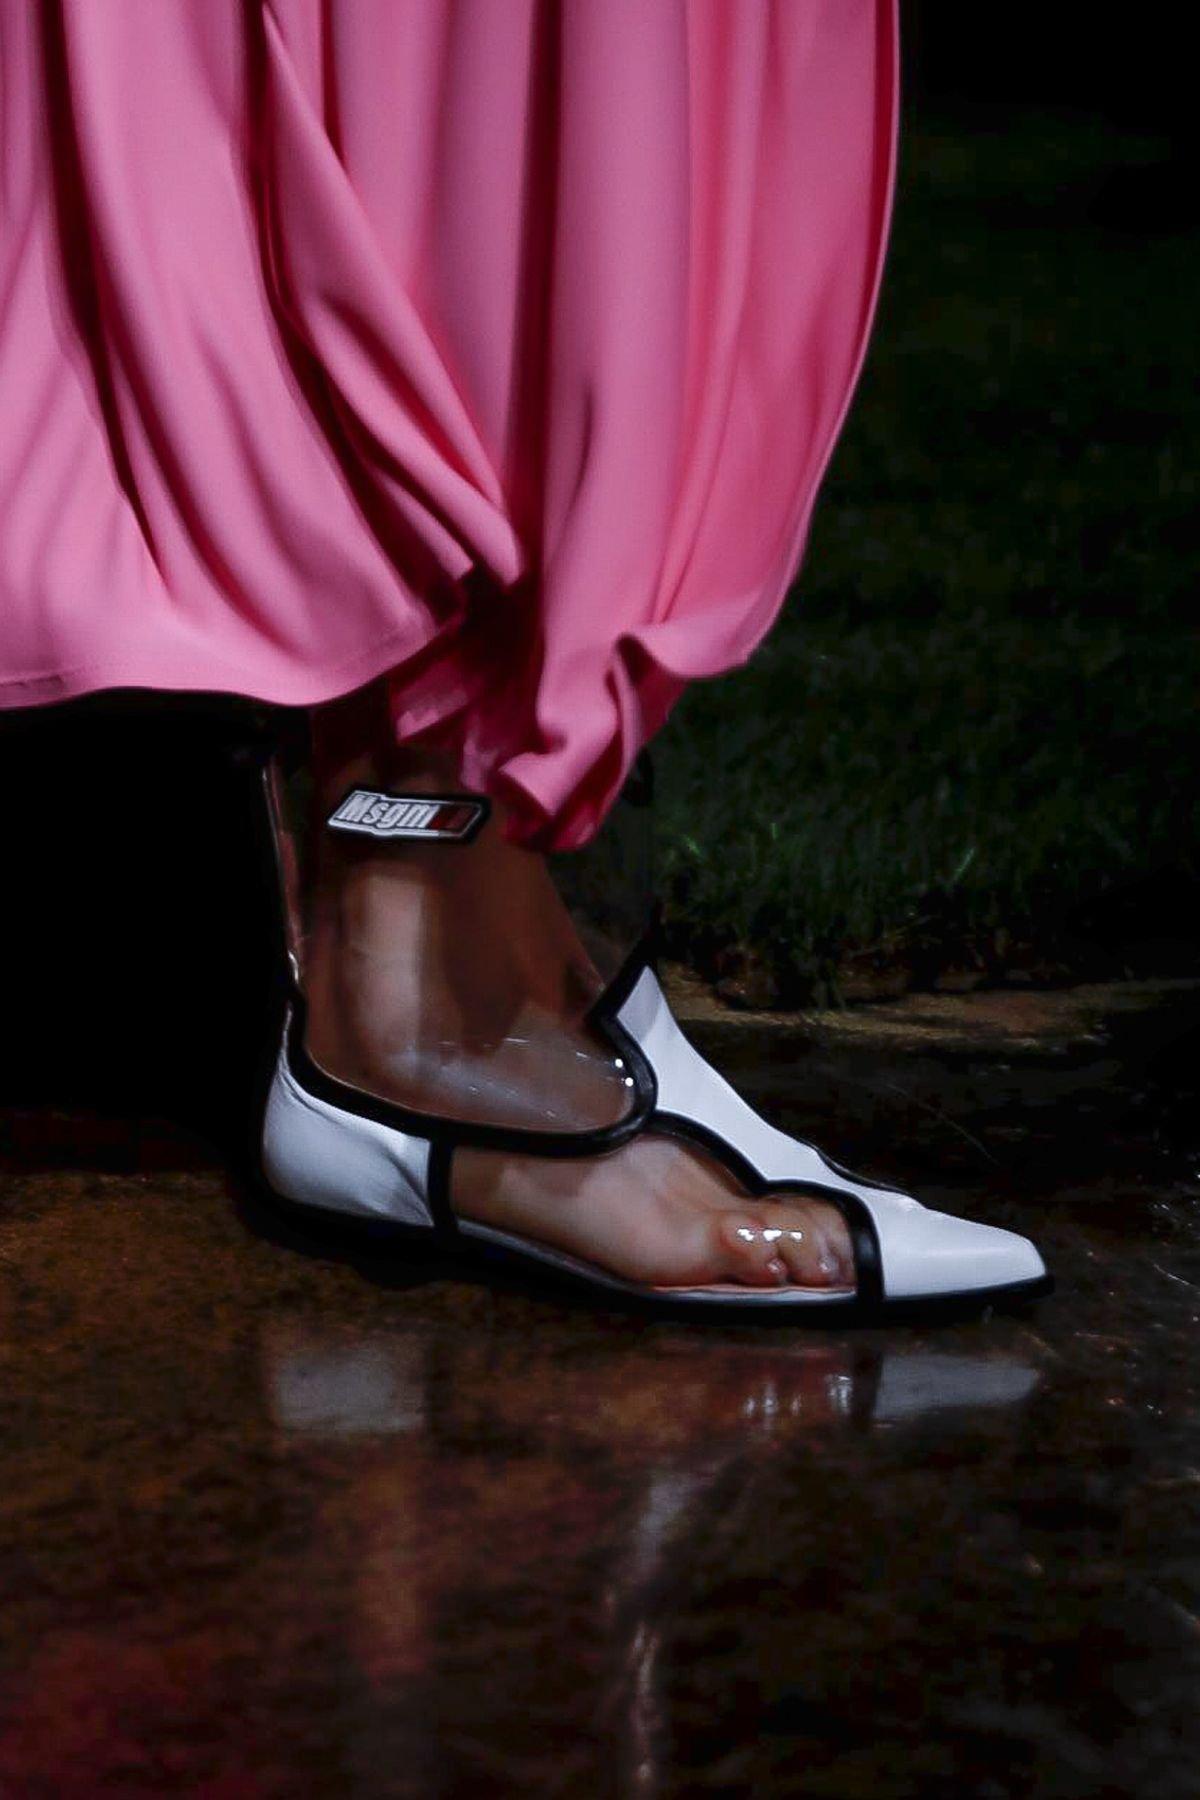 9ddfcb4a4 Mary Katrantzou shoes حذاء احذية رائجة ربيع 2019 plastic احذية بلاستيكية  msgm